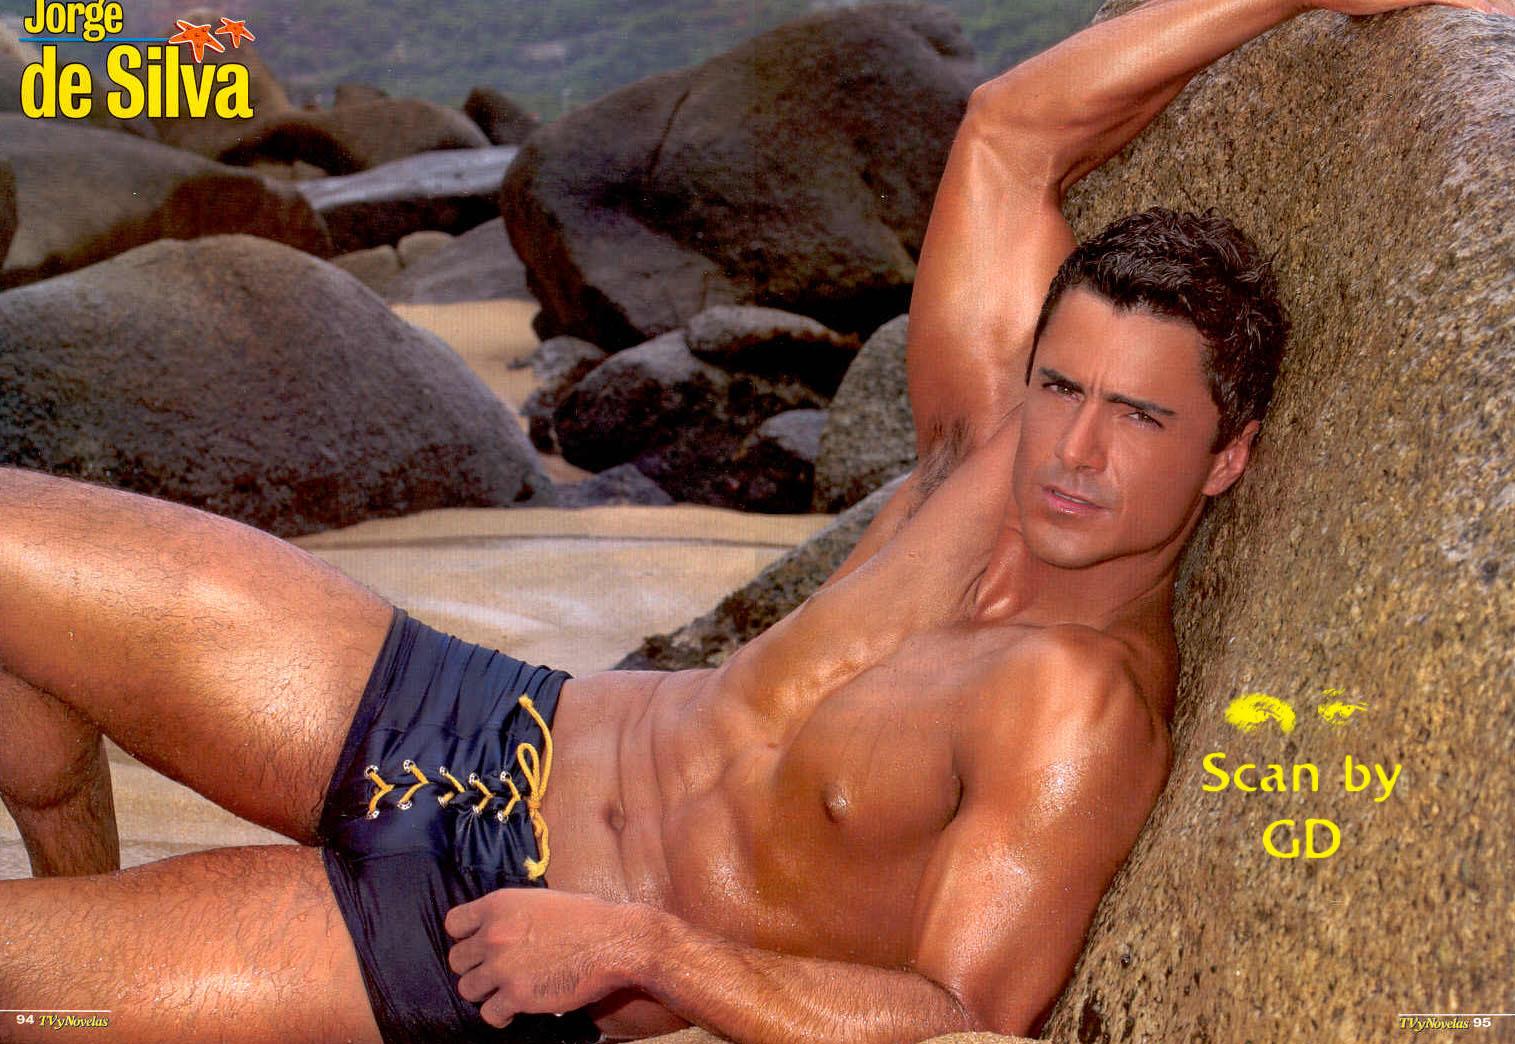 Jorge De Silva Naked 3